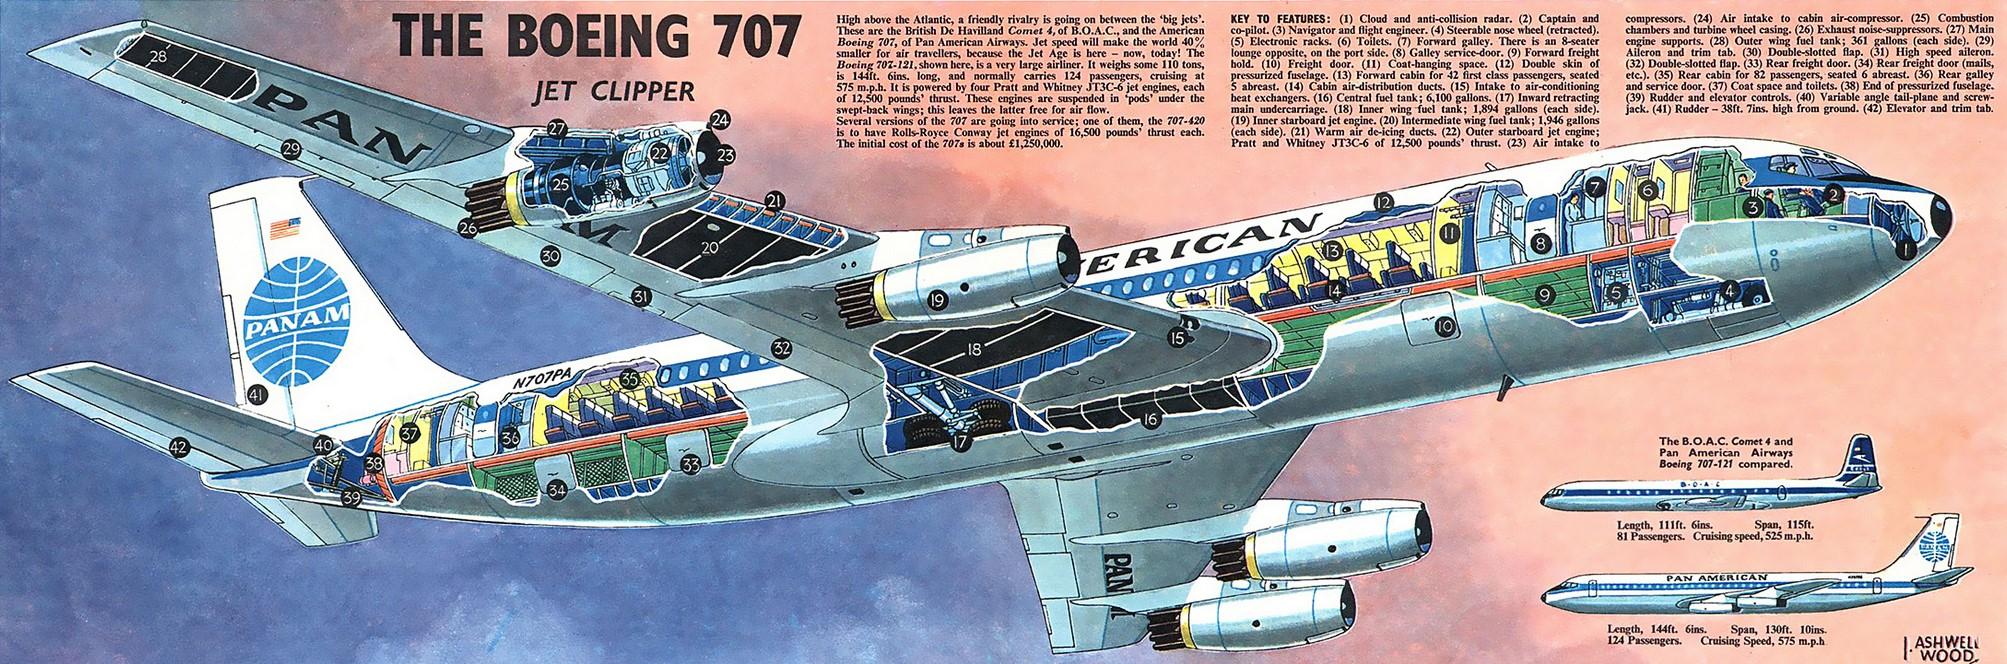 Boeing 707 PAN AM- podróż w wielkim stylu by LONG STORY SHORT